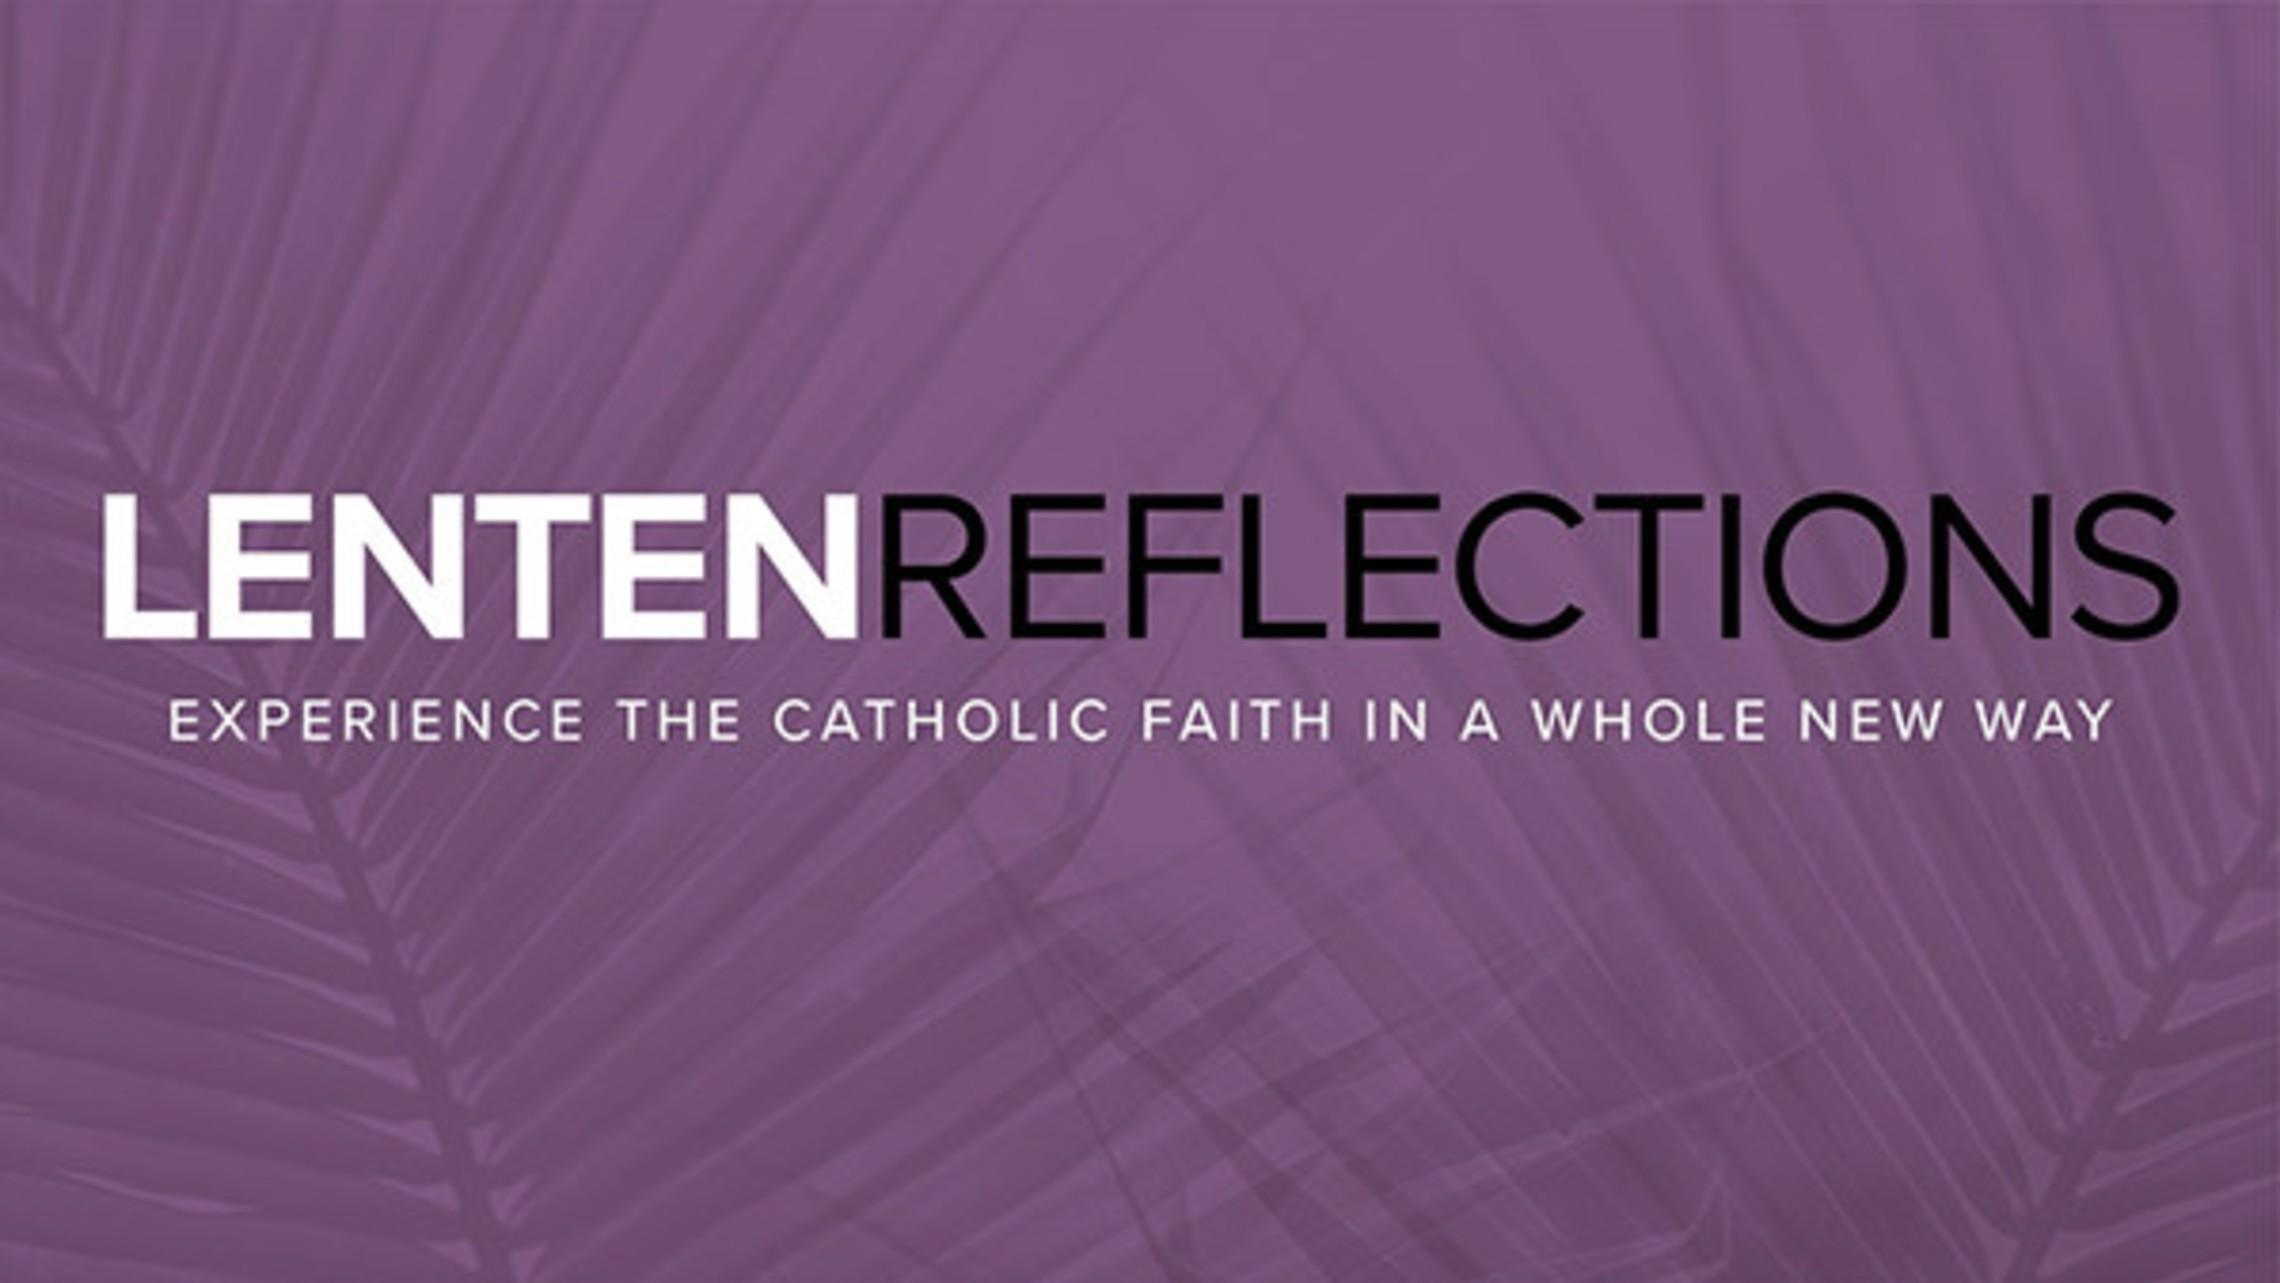 Formed Lenten Reflections